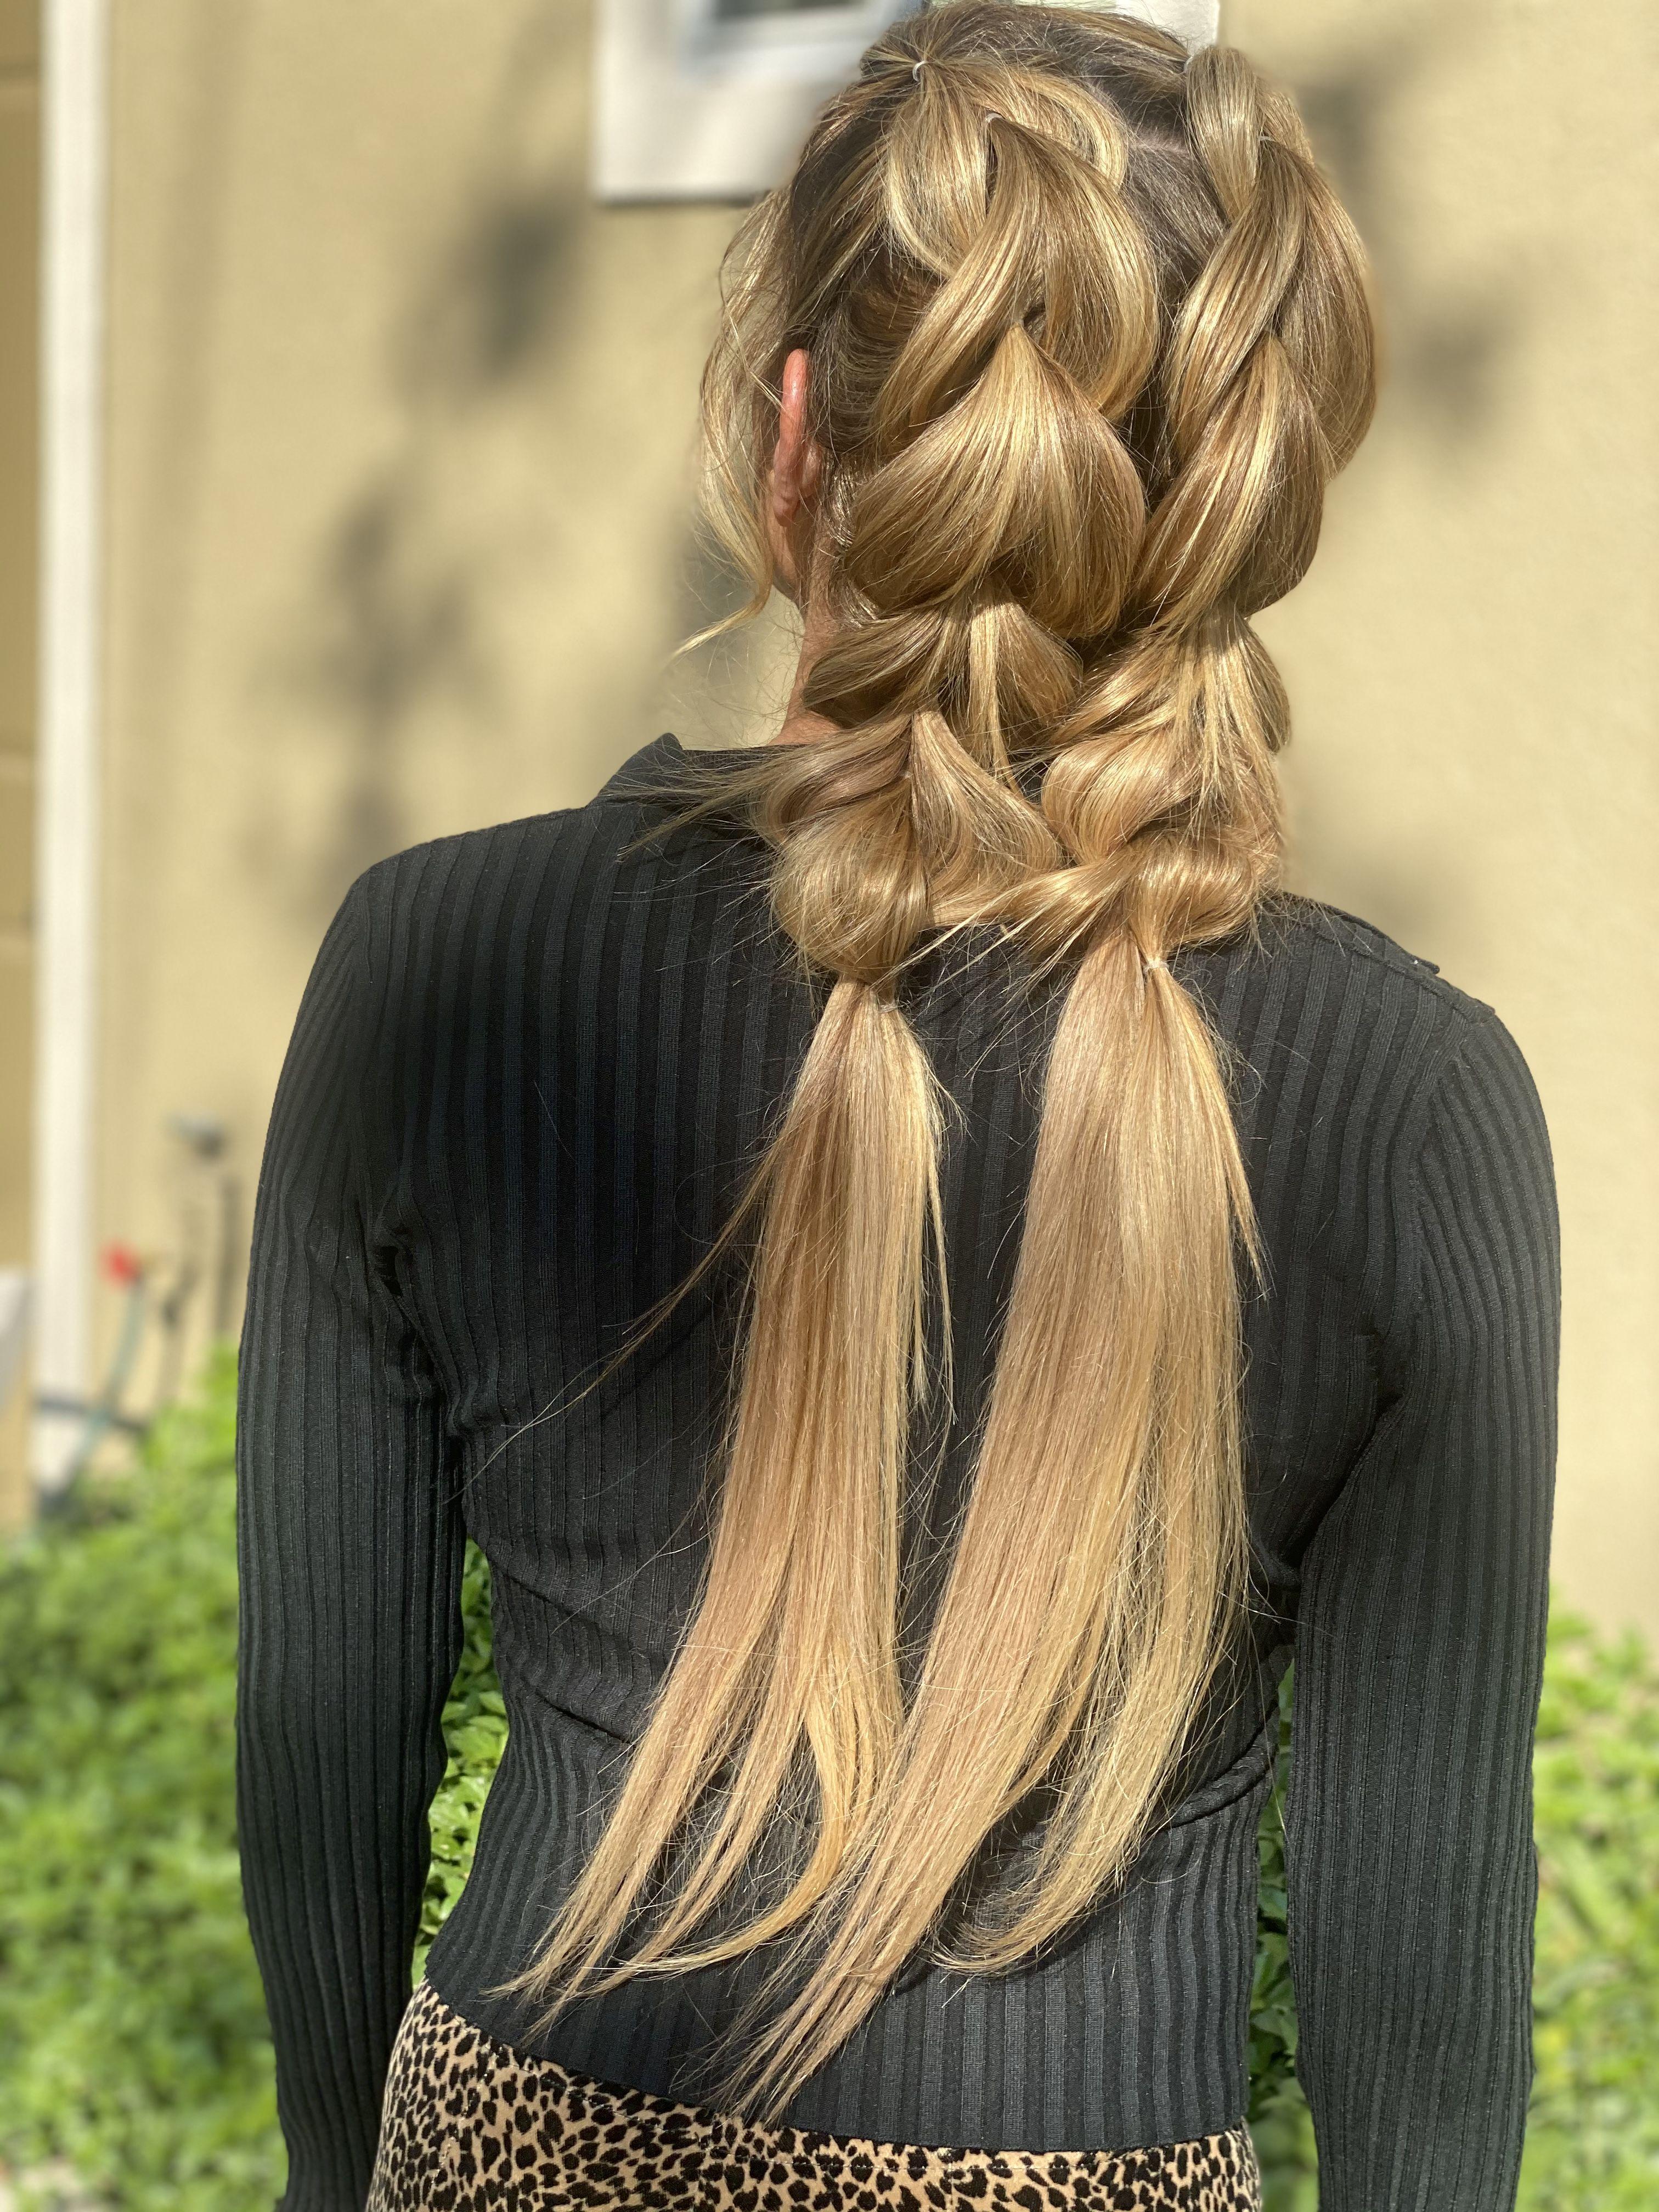 Game Day Hair In 2020 Game Day Hair Hair Styles Hair